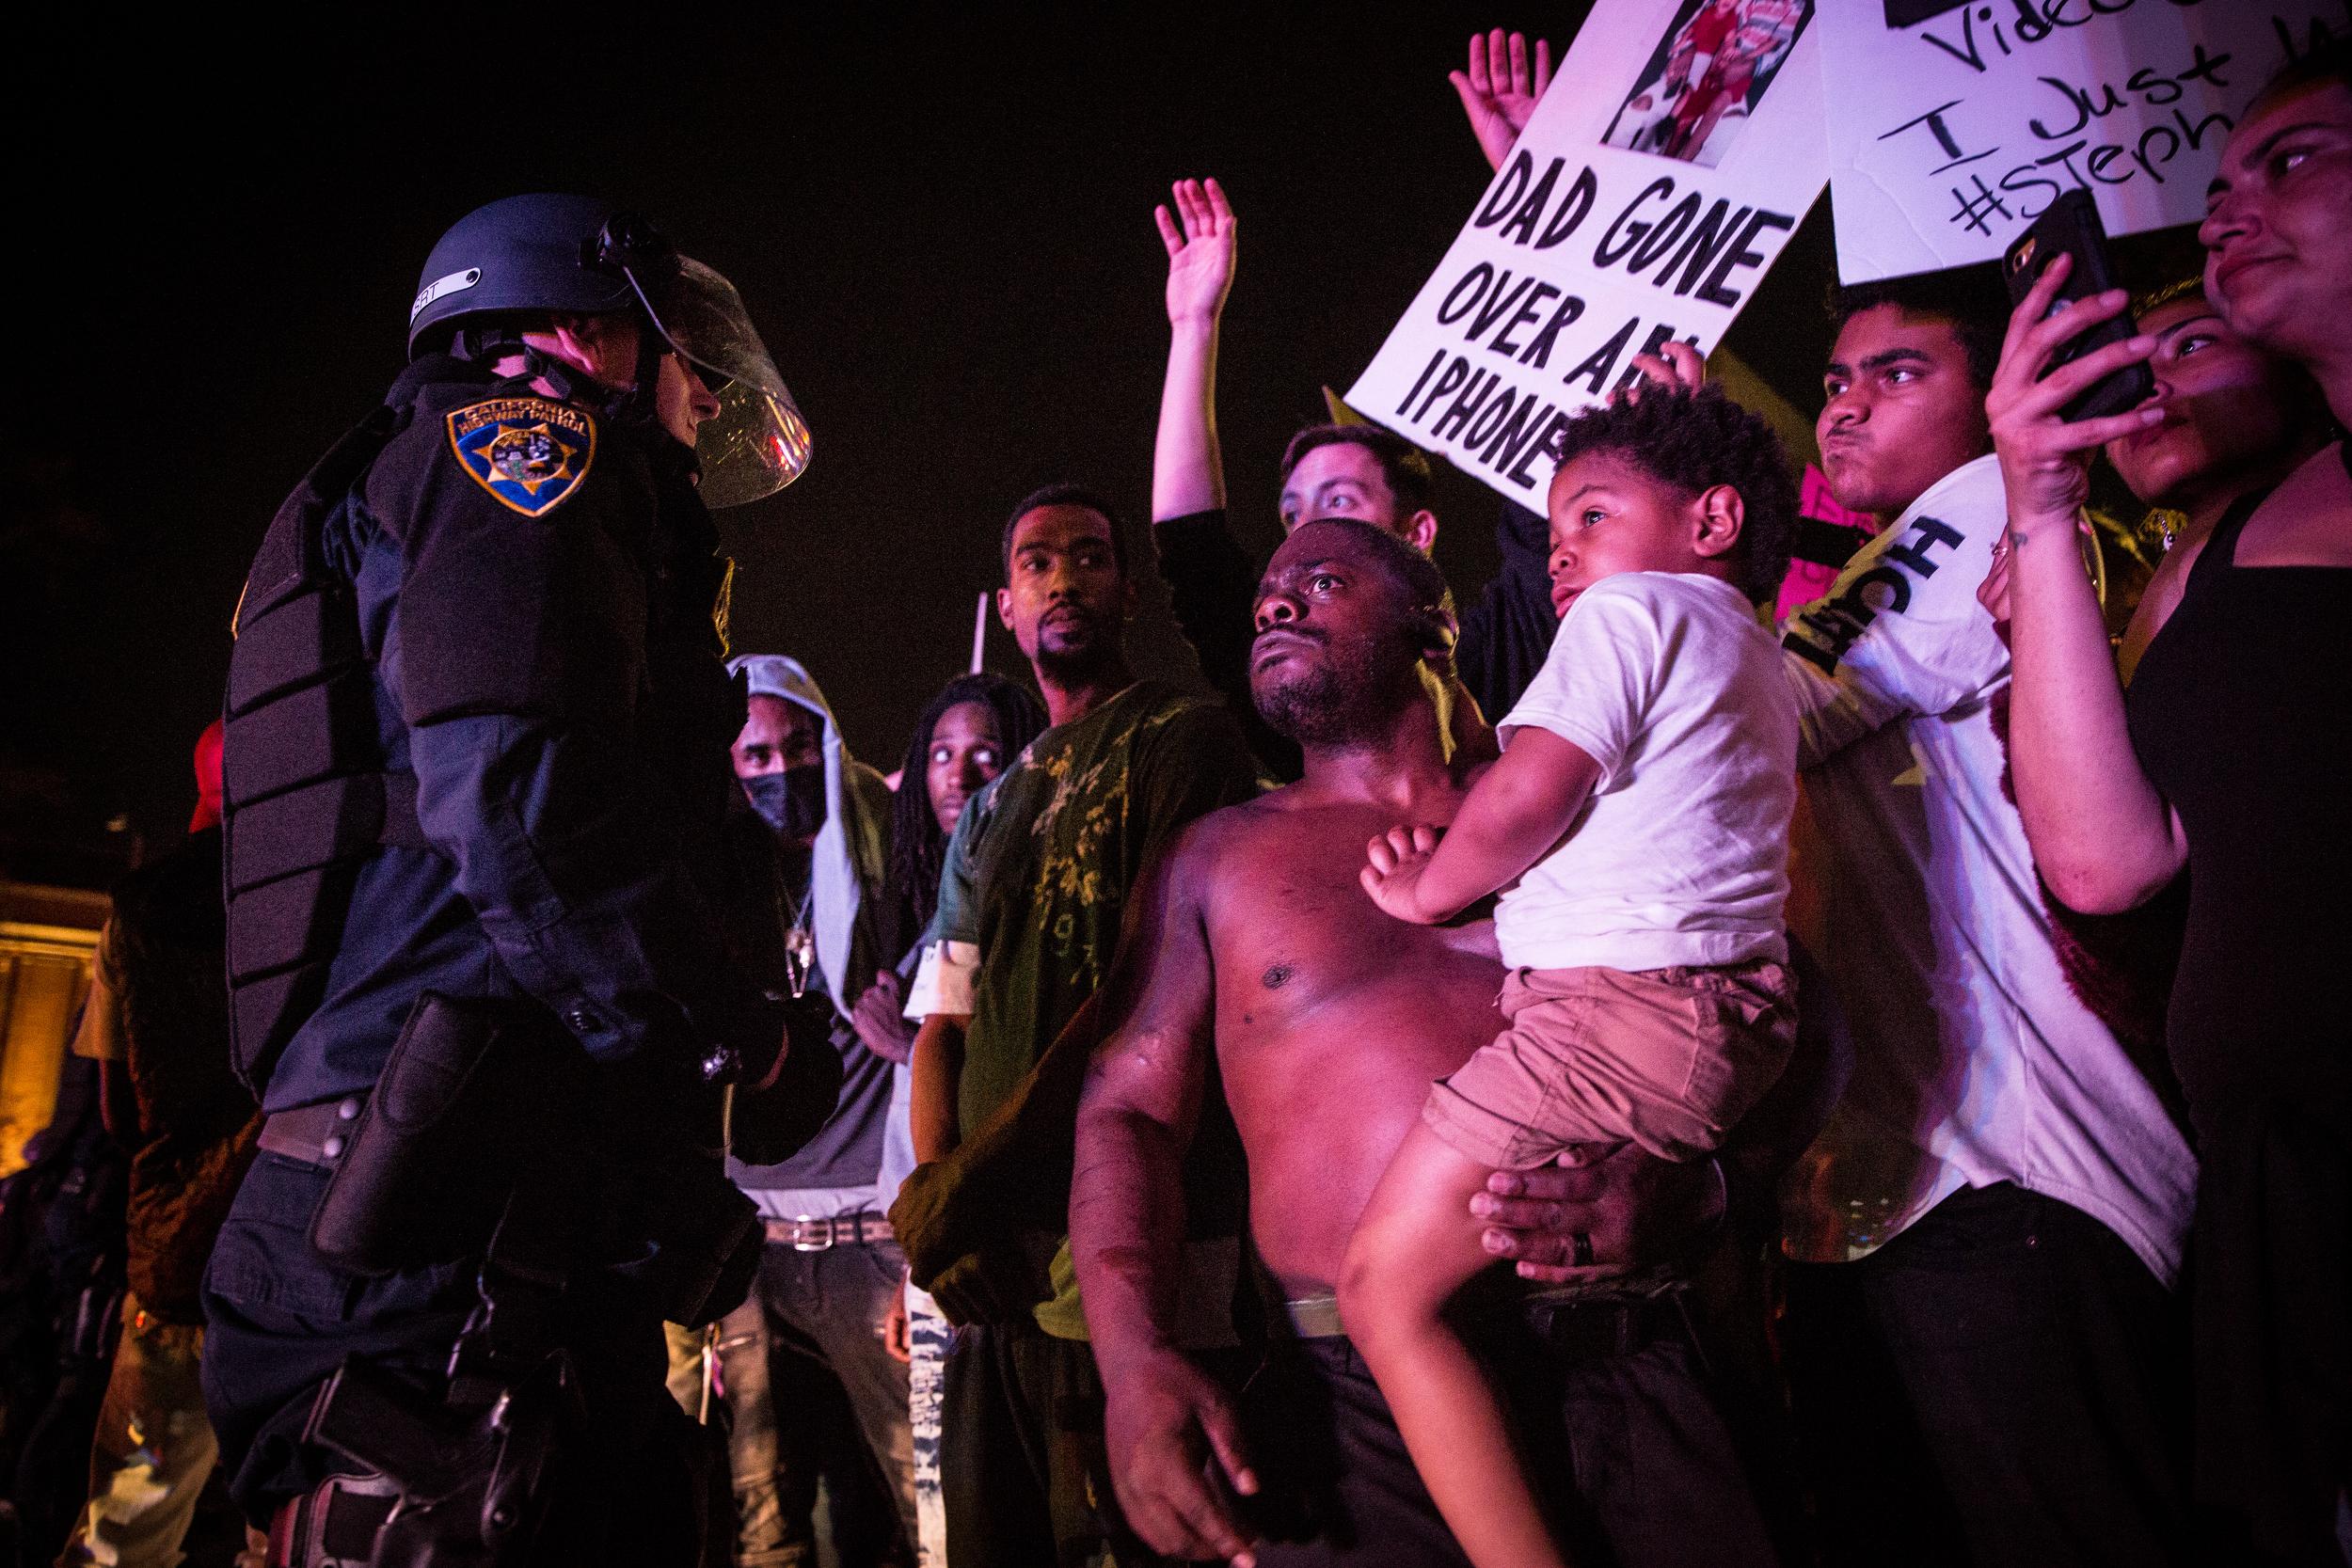 Law enforcement face off against Black Lives Matter protestors in downtown Sacramento on MArch 30, 2018.